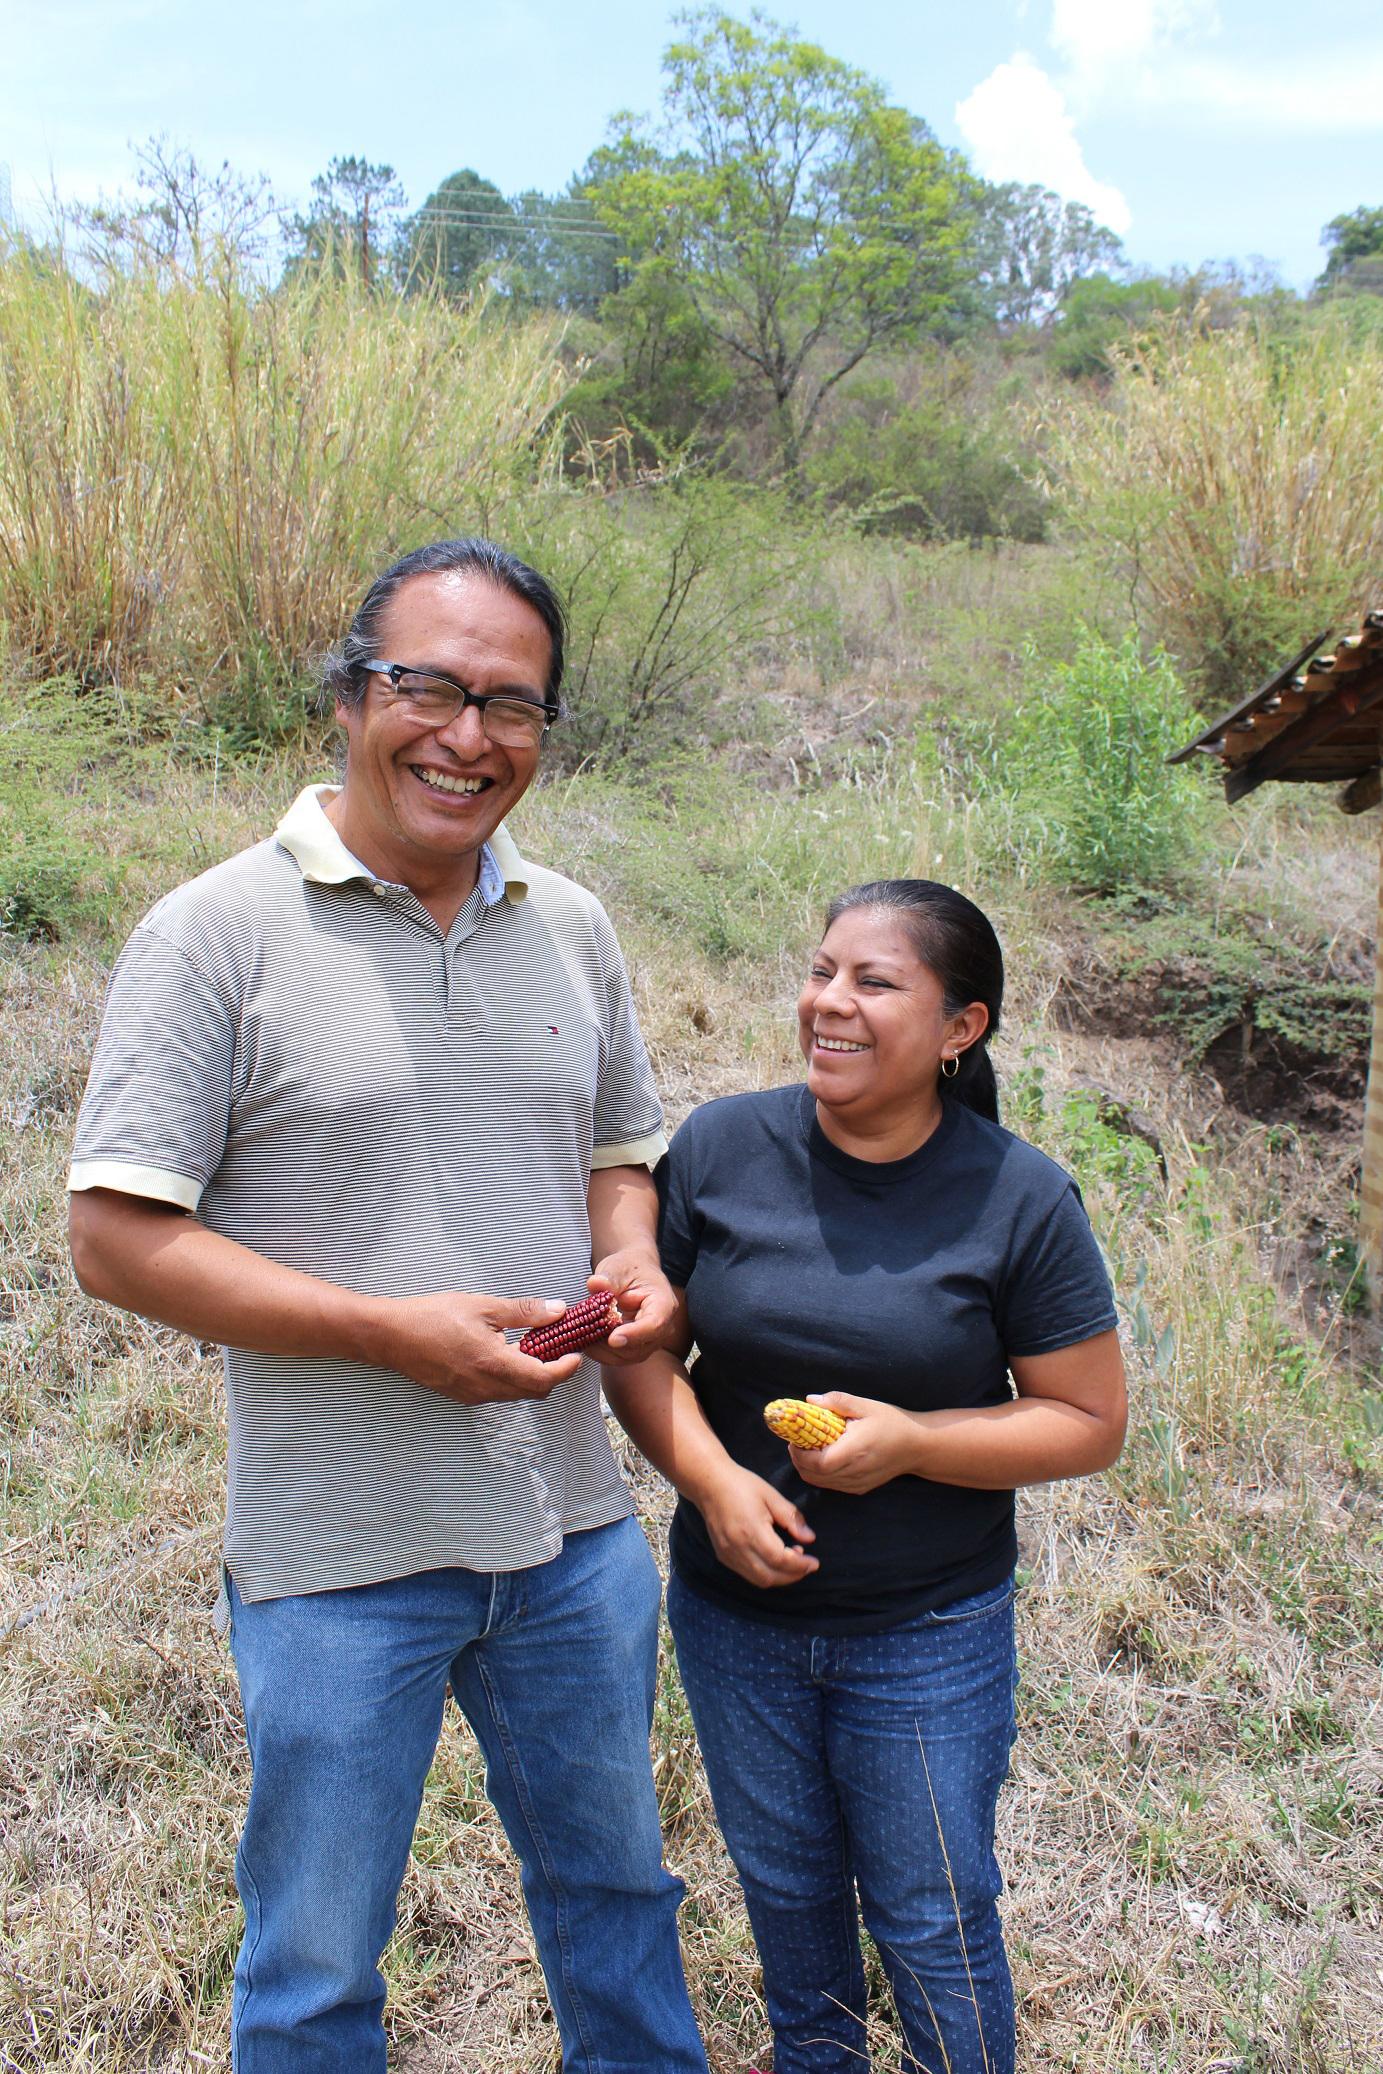 Gonzalez Rojas and Gabriela Linares Sosa are activists for indigenous communities with the Union of Organizations of the Sierra Juarez of Oaxaca (UNOSJO). <em>Seth Jovaag(TTBOOK)</em>